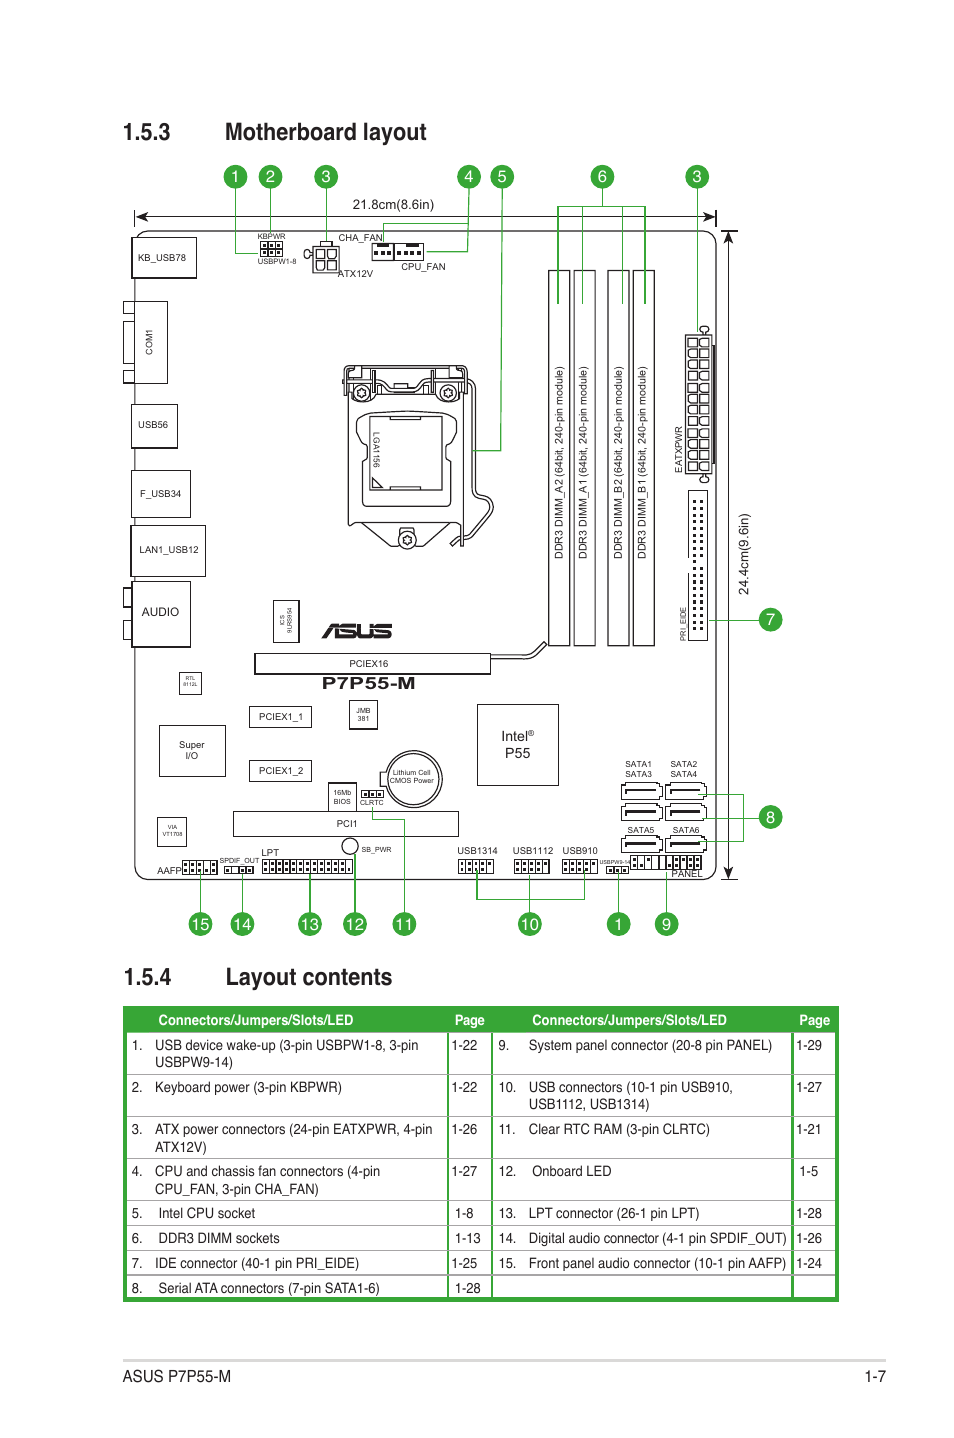 Motherboard Layout Diagram - More Wiring Diagram